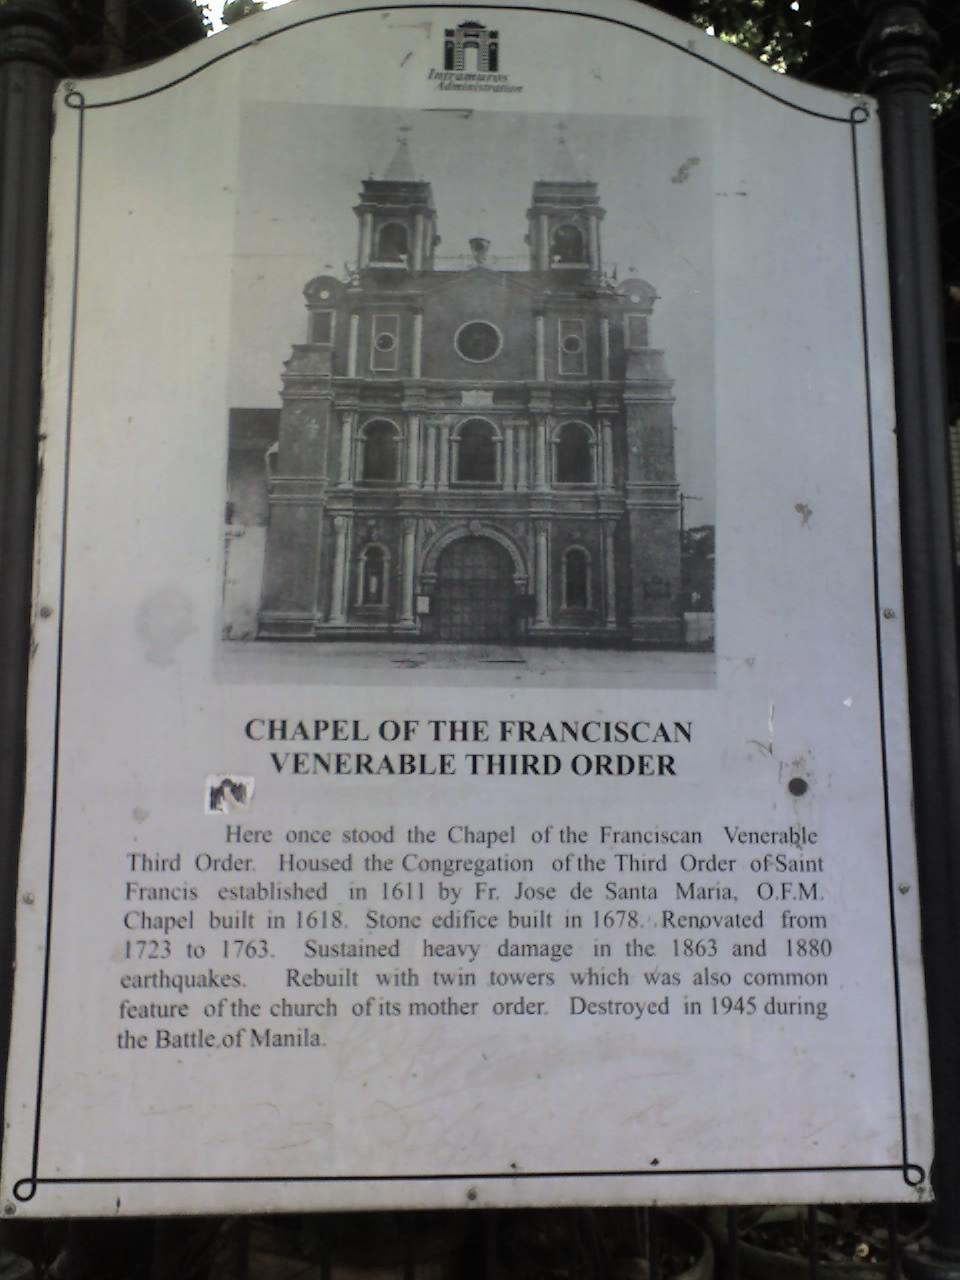 CHAPEL OF THE FRANCISCAN VENERABLE THIRD ORDER